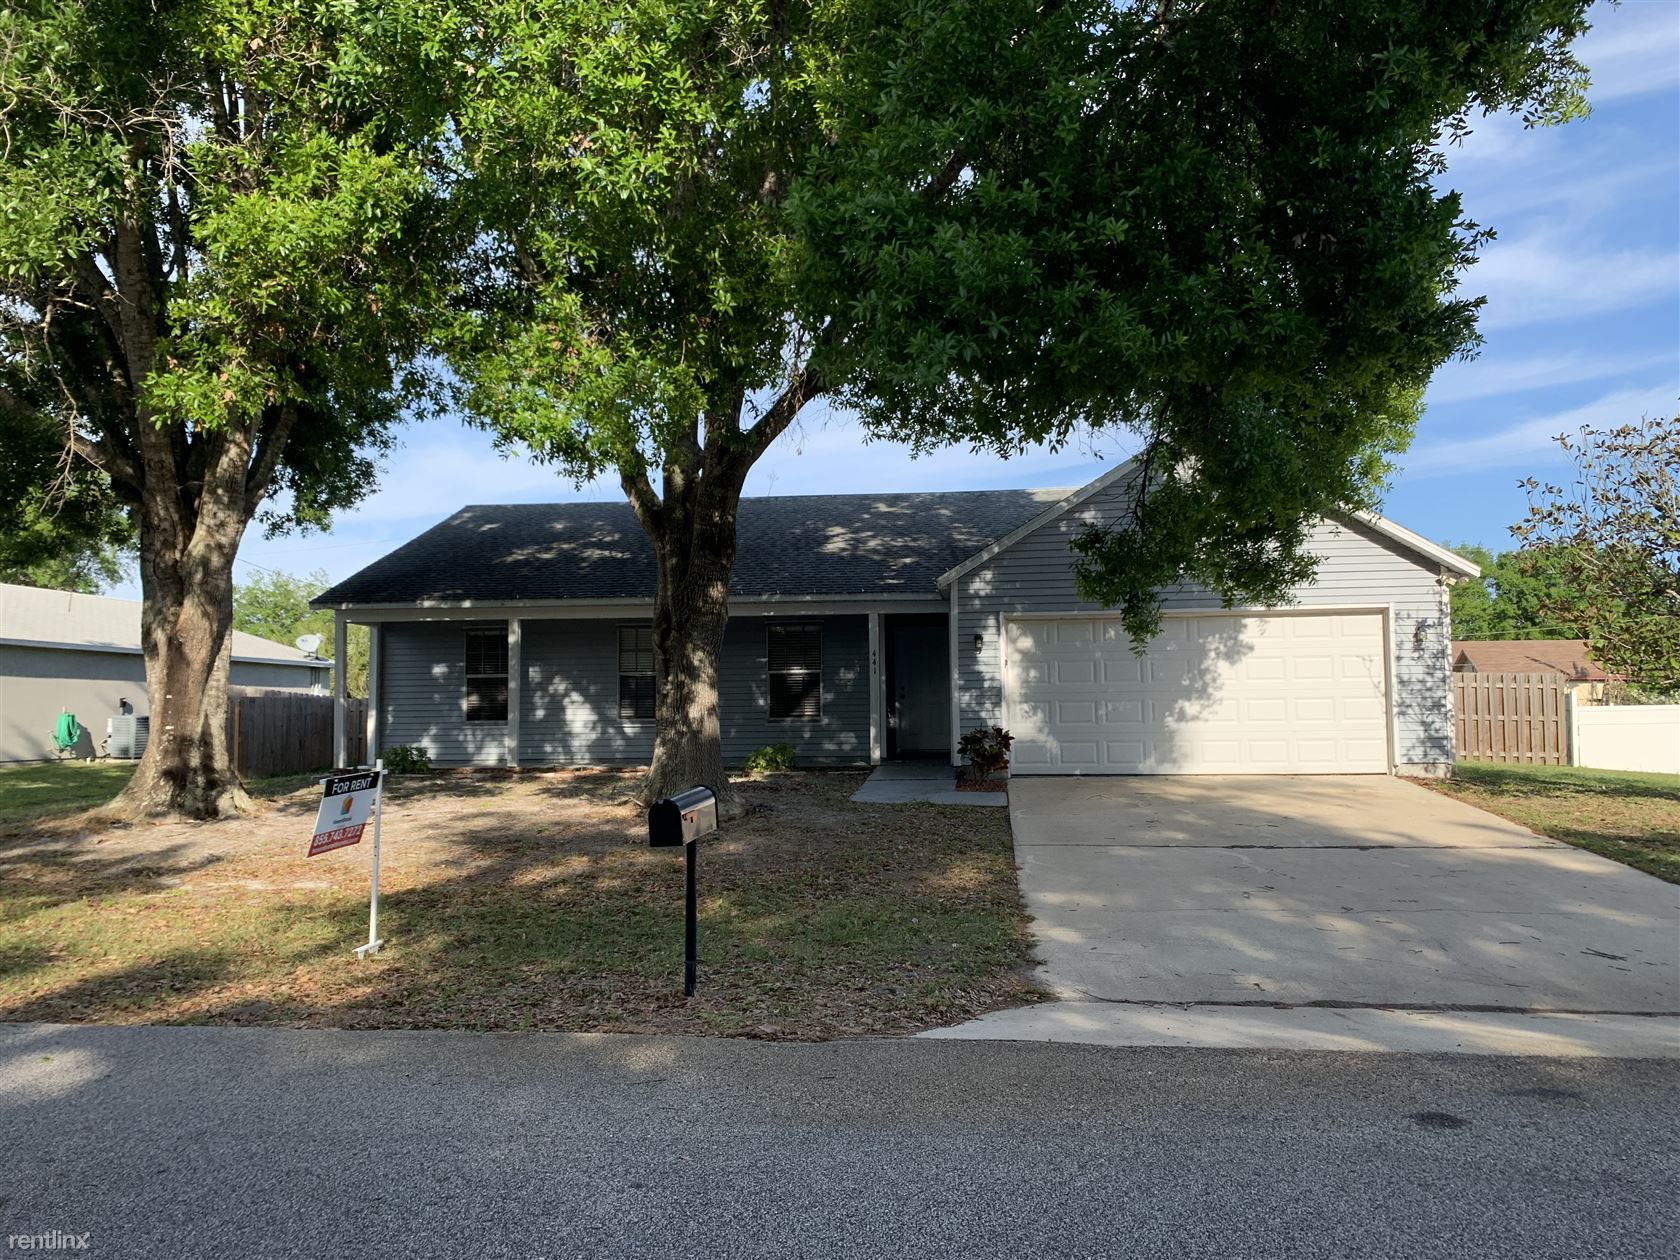 441 Dunbar Ave NE, Palm Bay, FL - $1,399